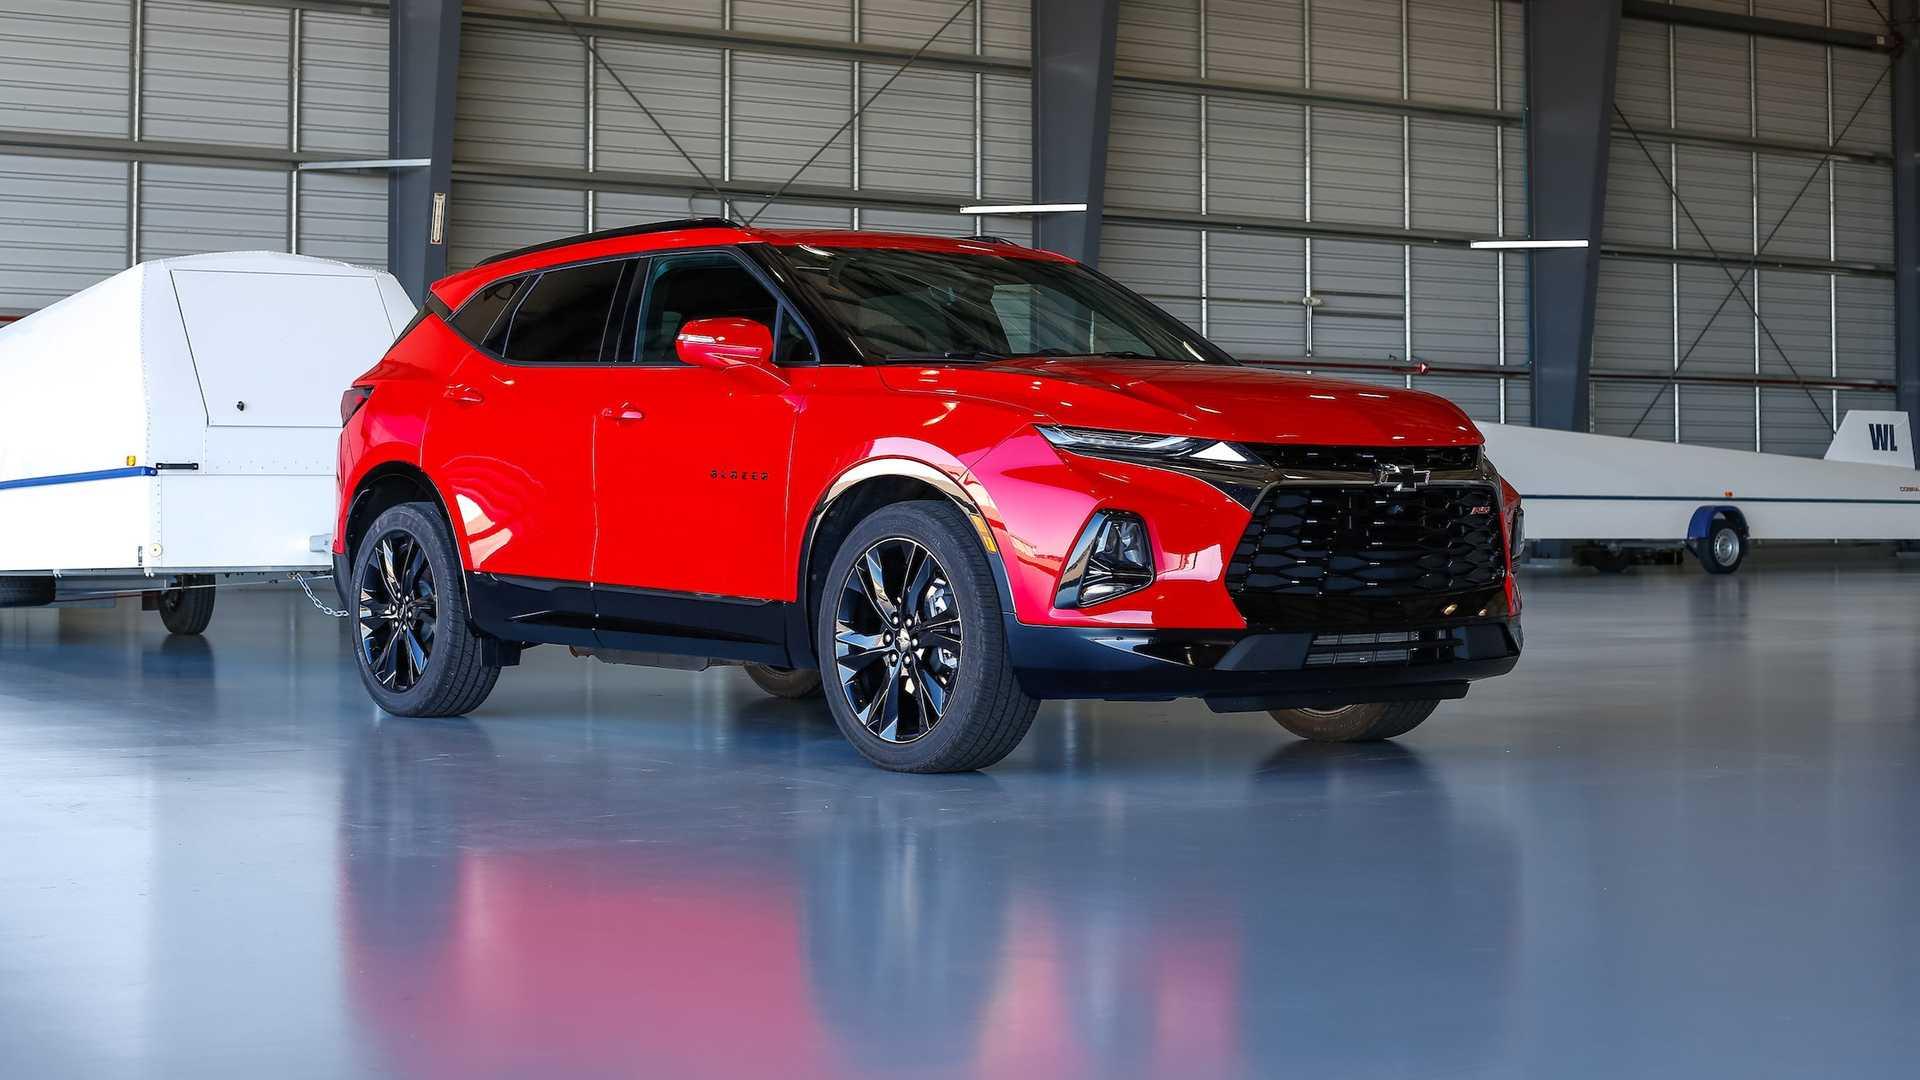 2019-chevrolet-blazer-first-drive-danh-gia-4.jpg